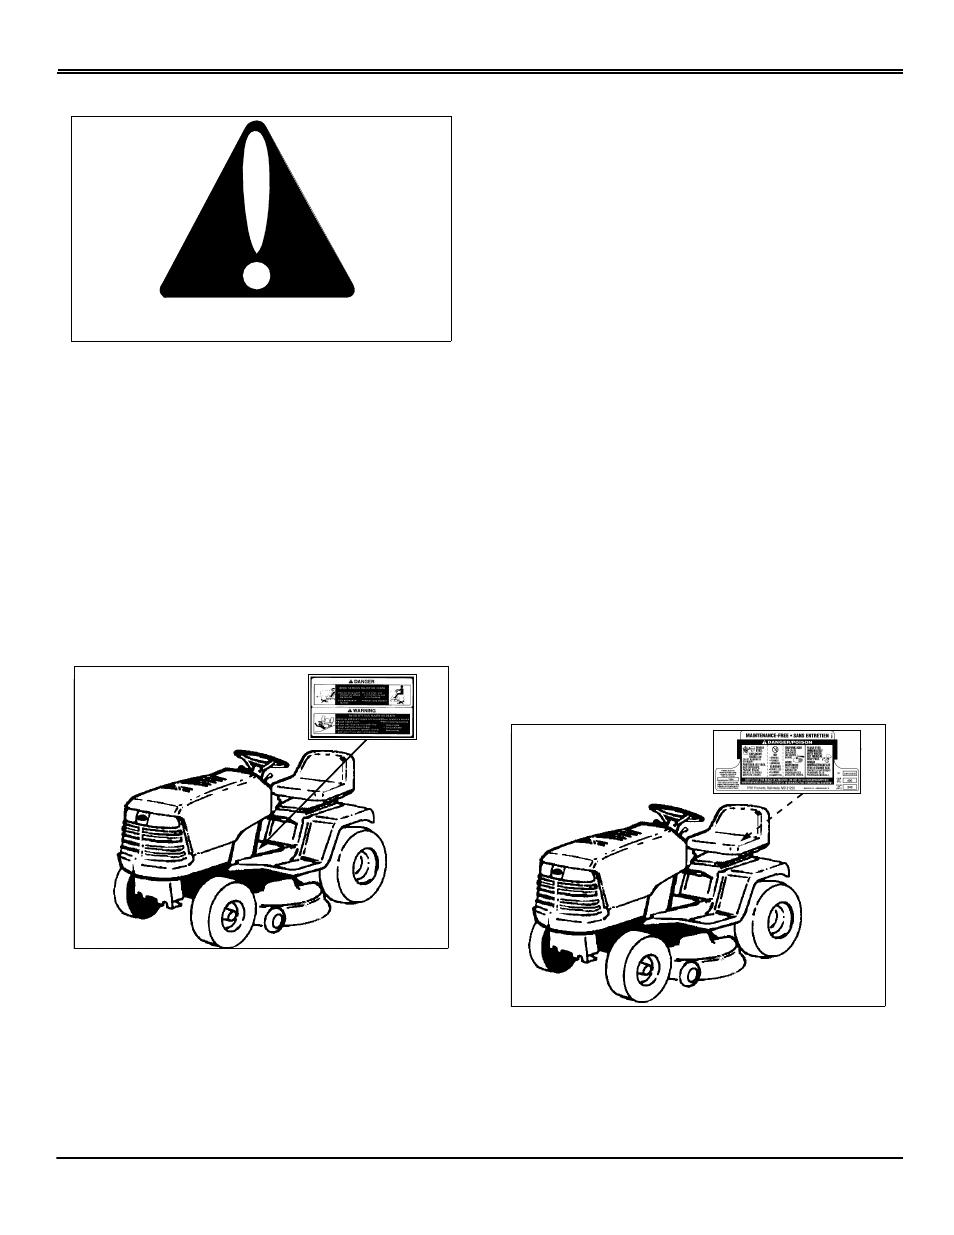 Safety Signs Safety Alert Symbol Safety Labels Labels Safety